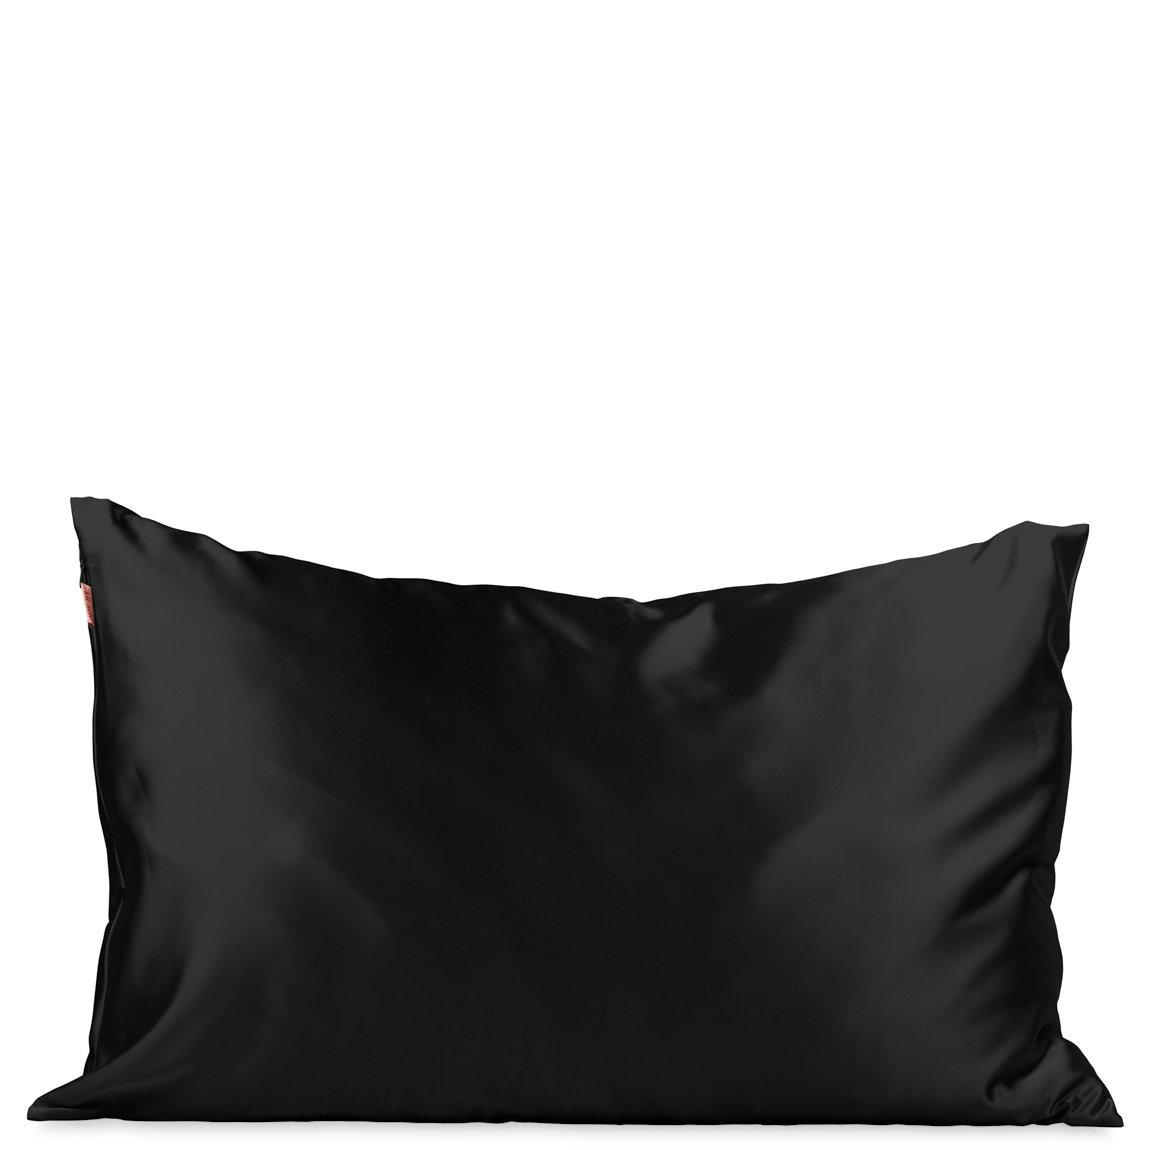 Kitsch Satin Pillowcase Black alternative view 1 - product swatch.